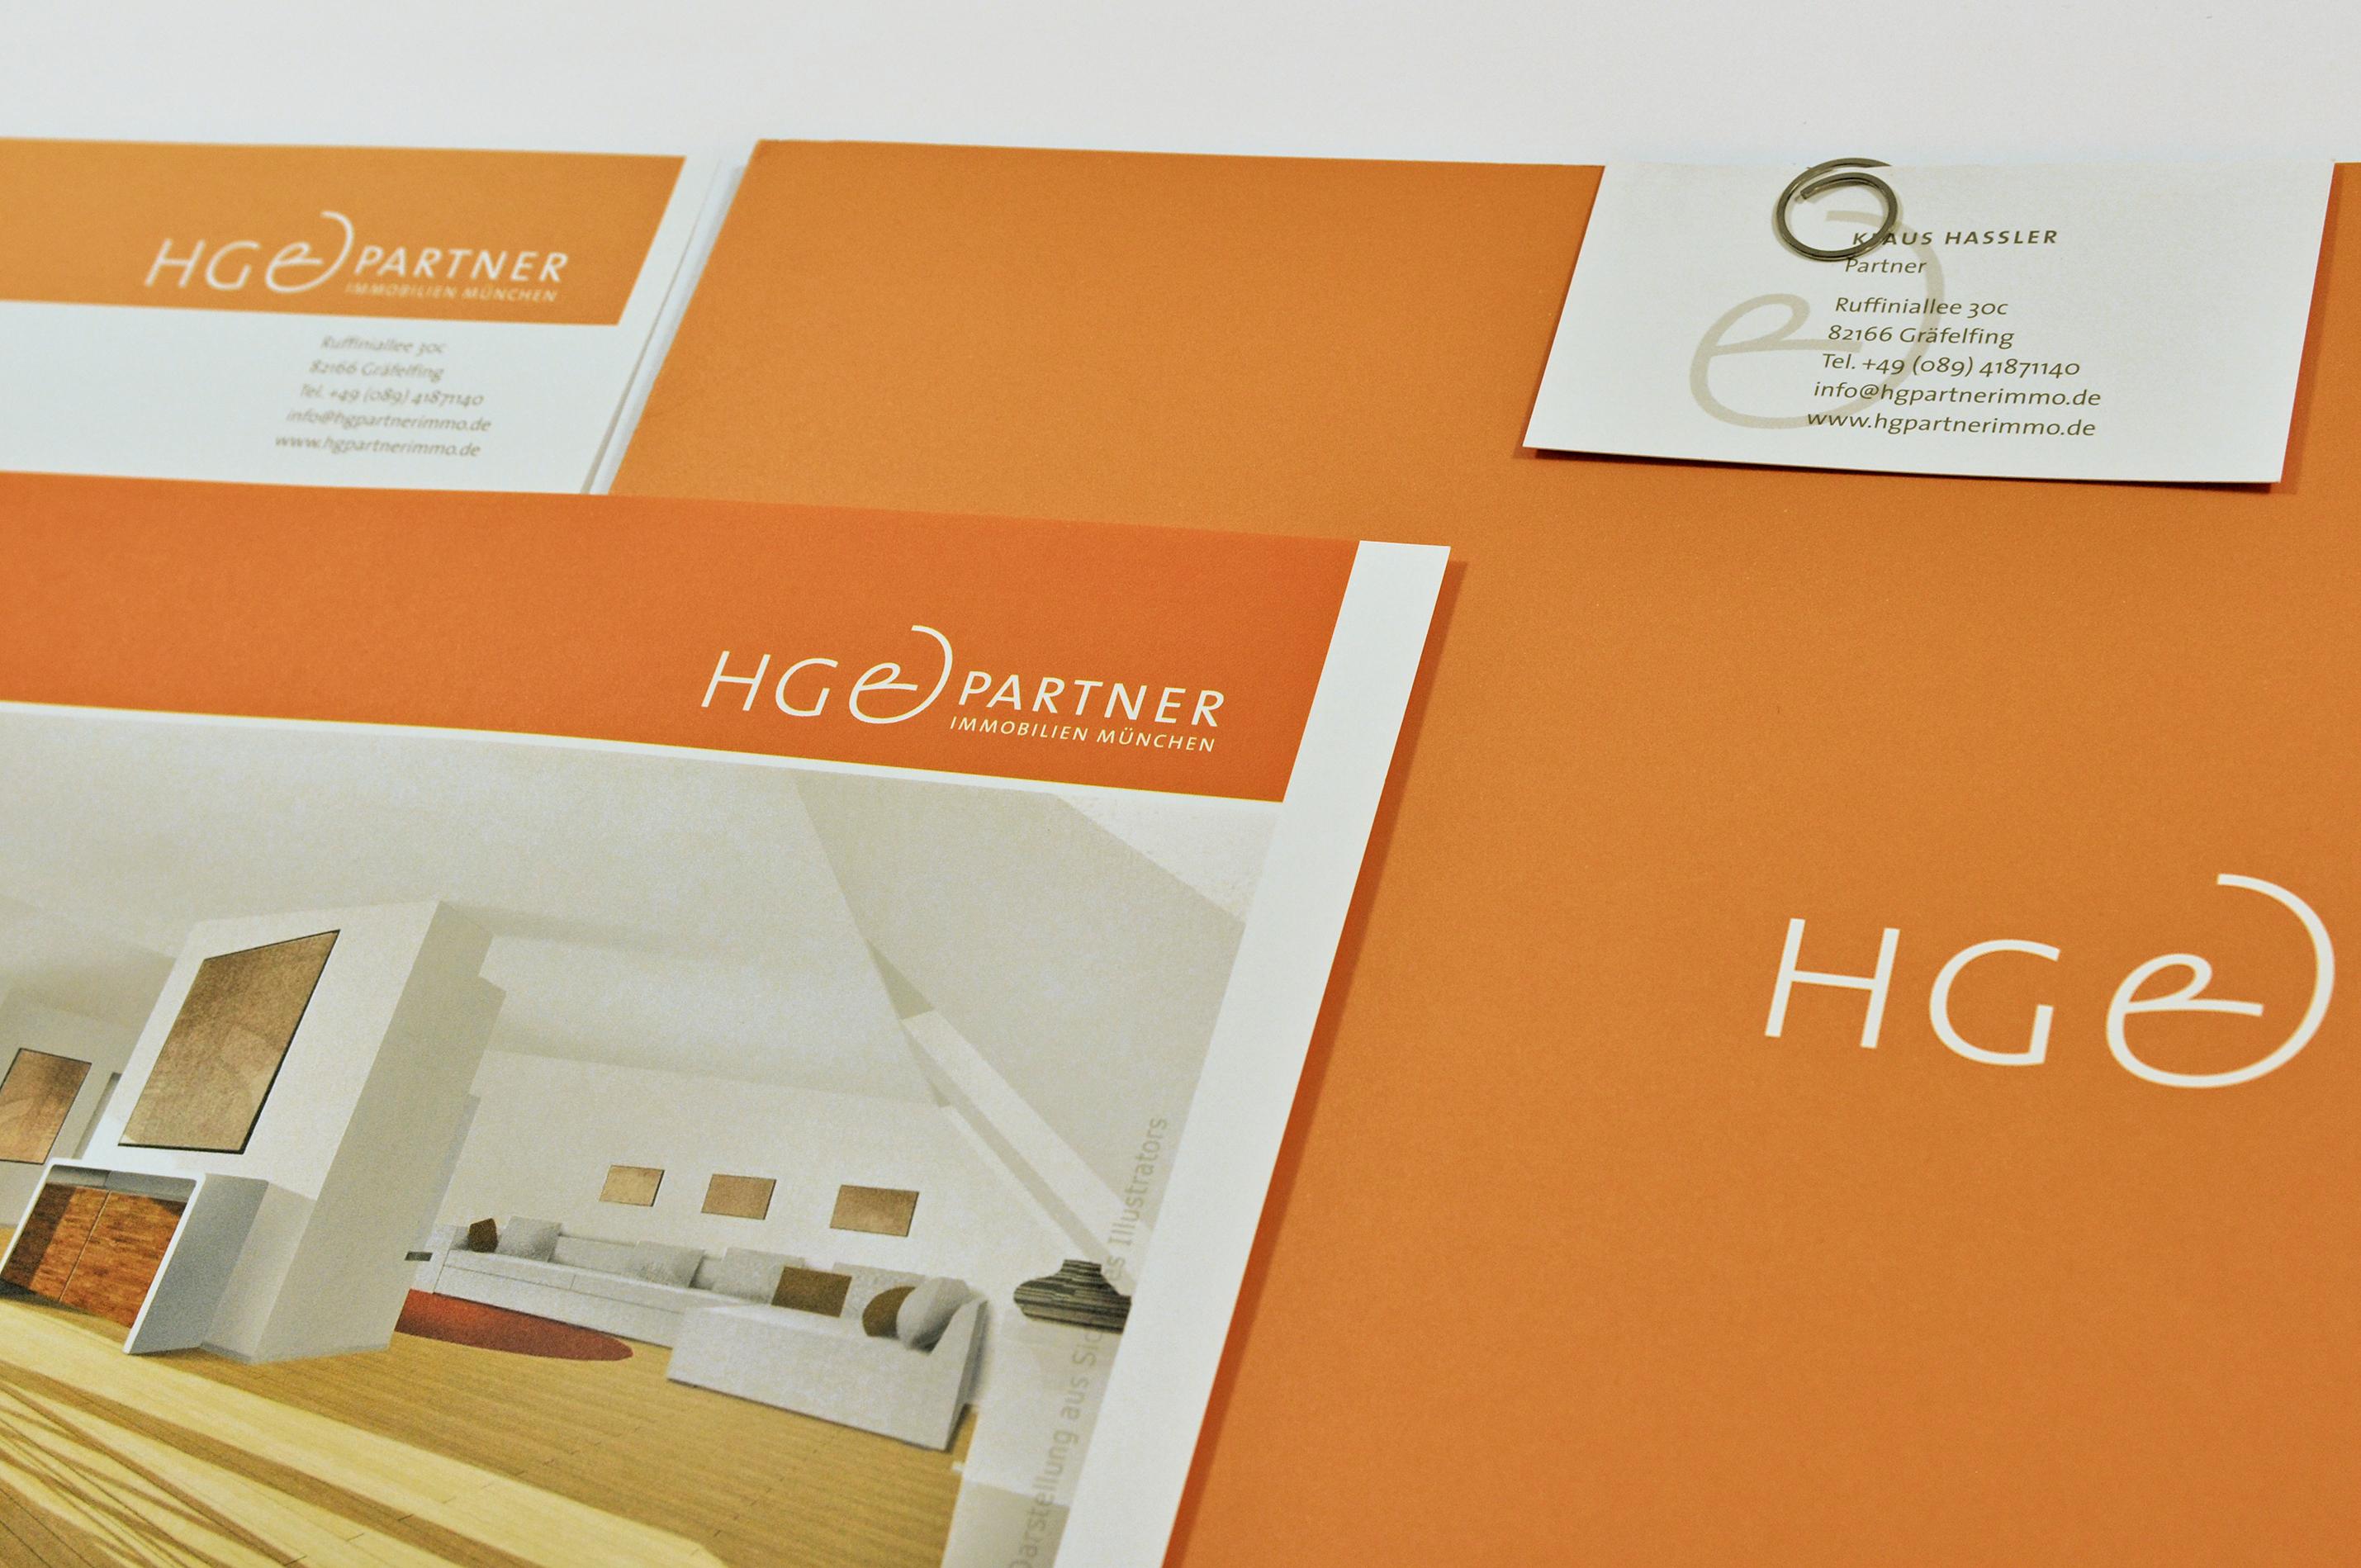 HG + Partner Immobilien München, Corporate Design